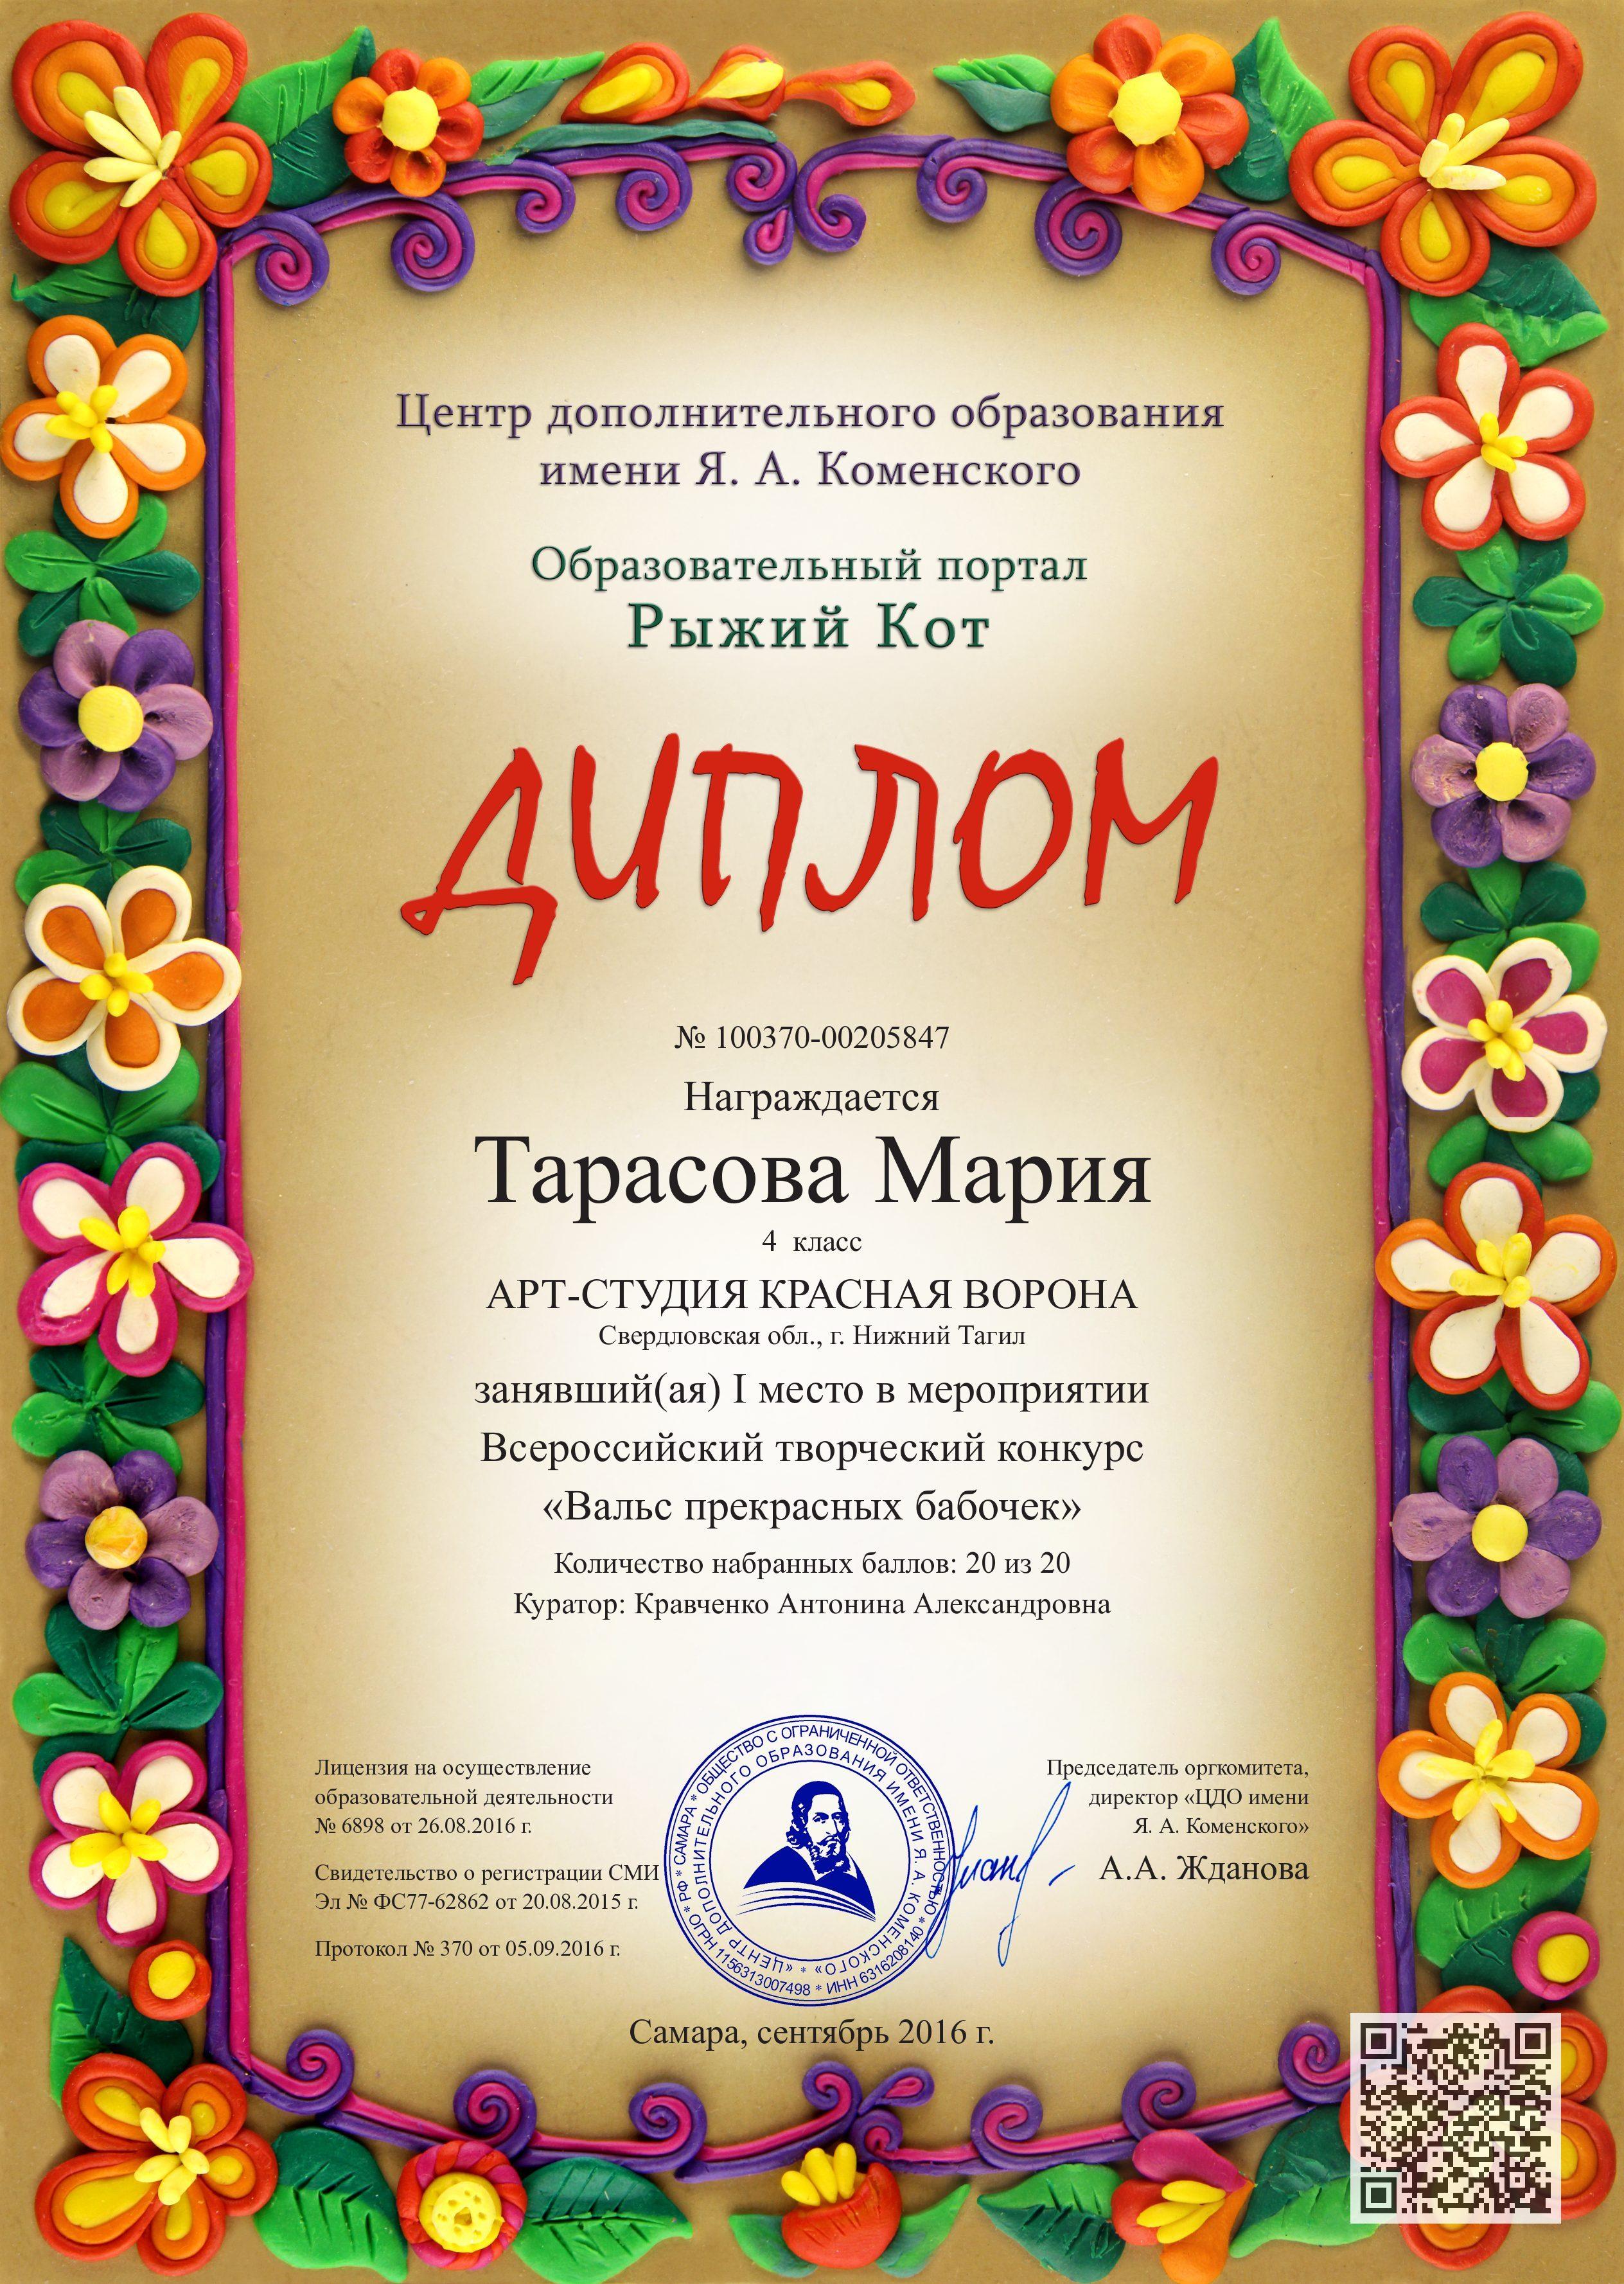 Тарасова Мария 1 место